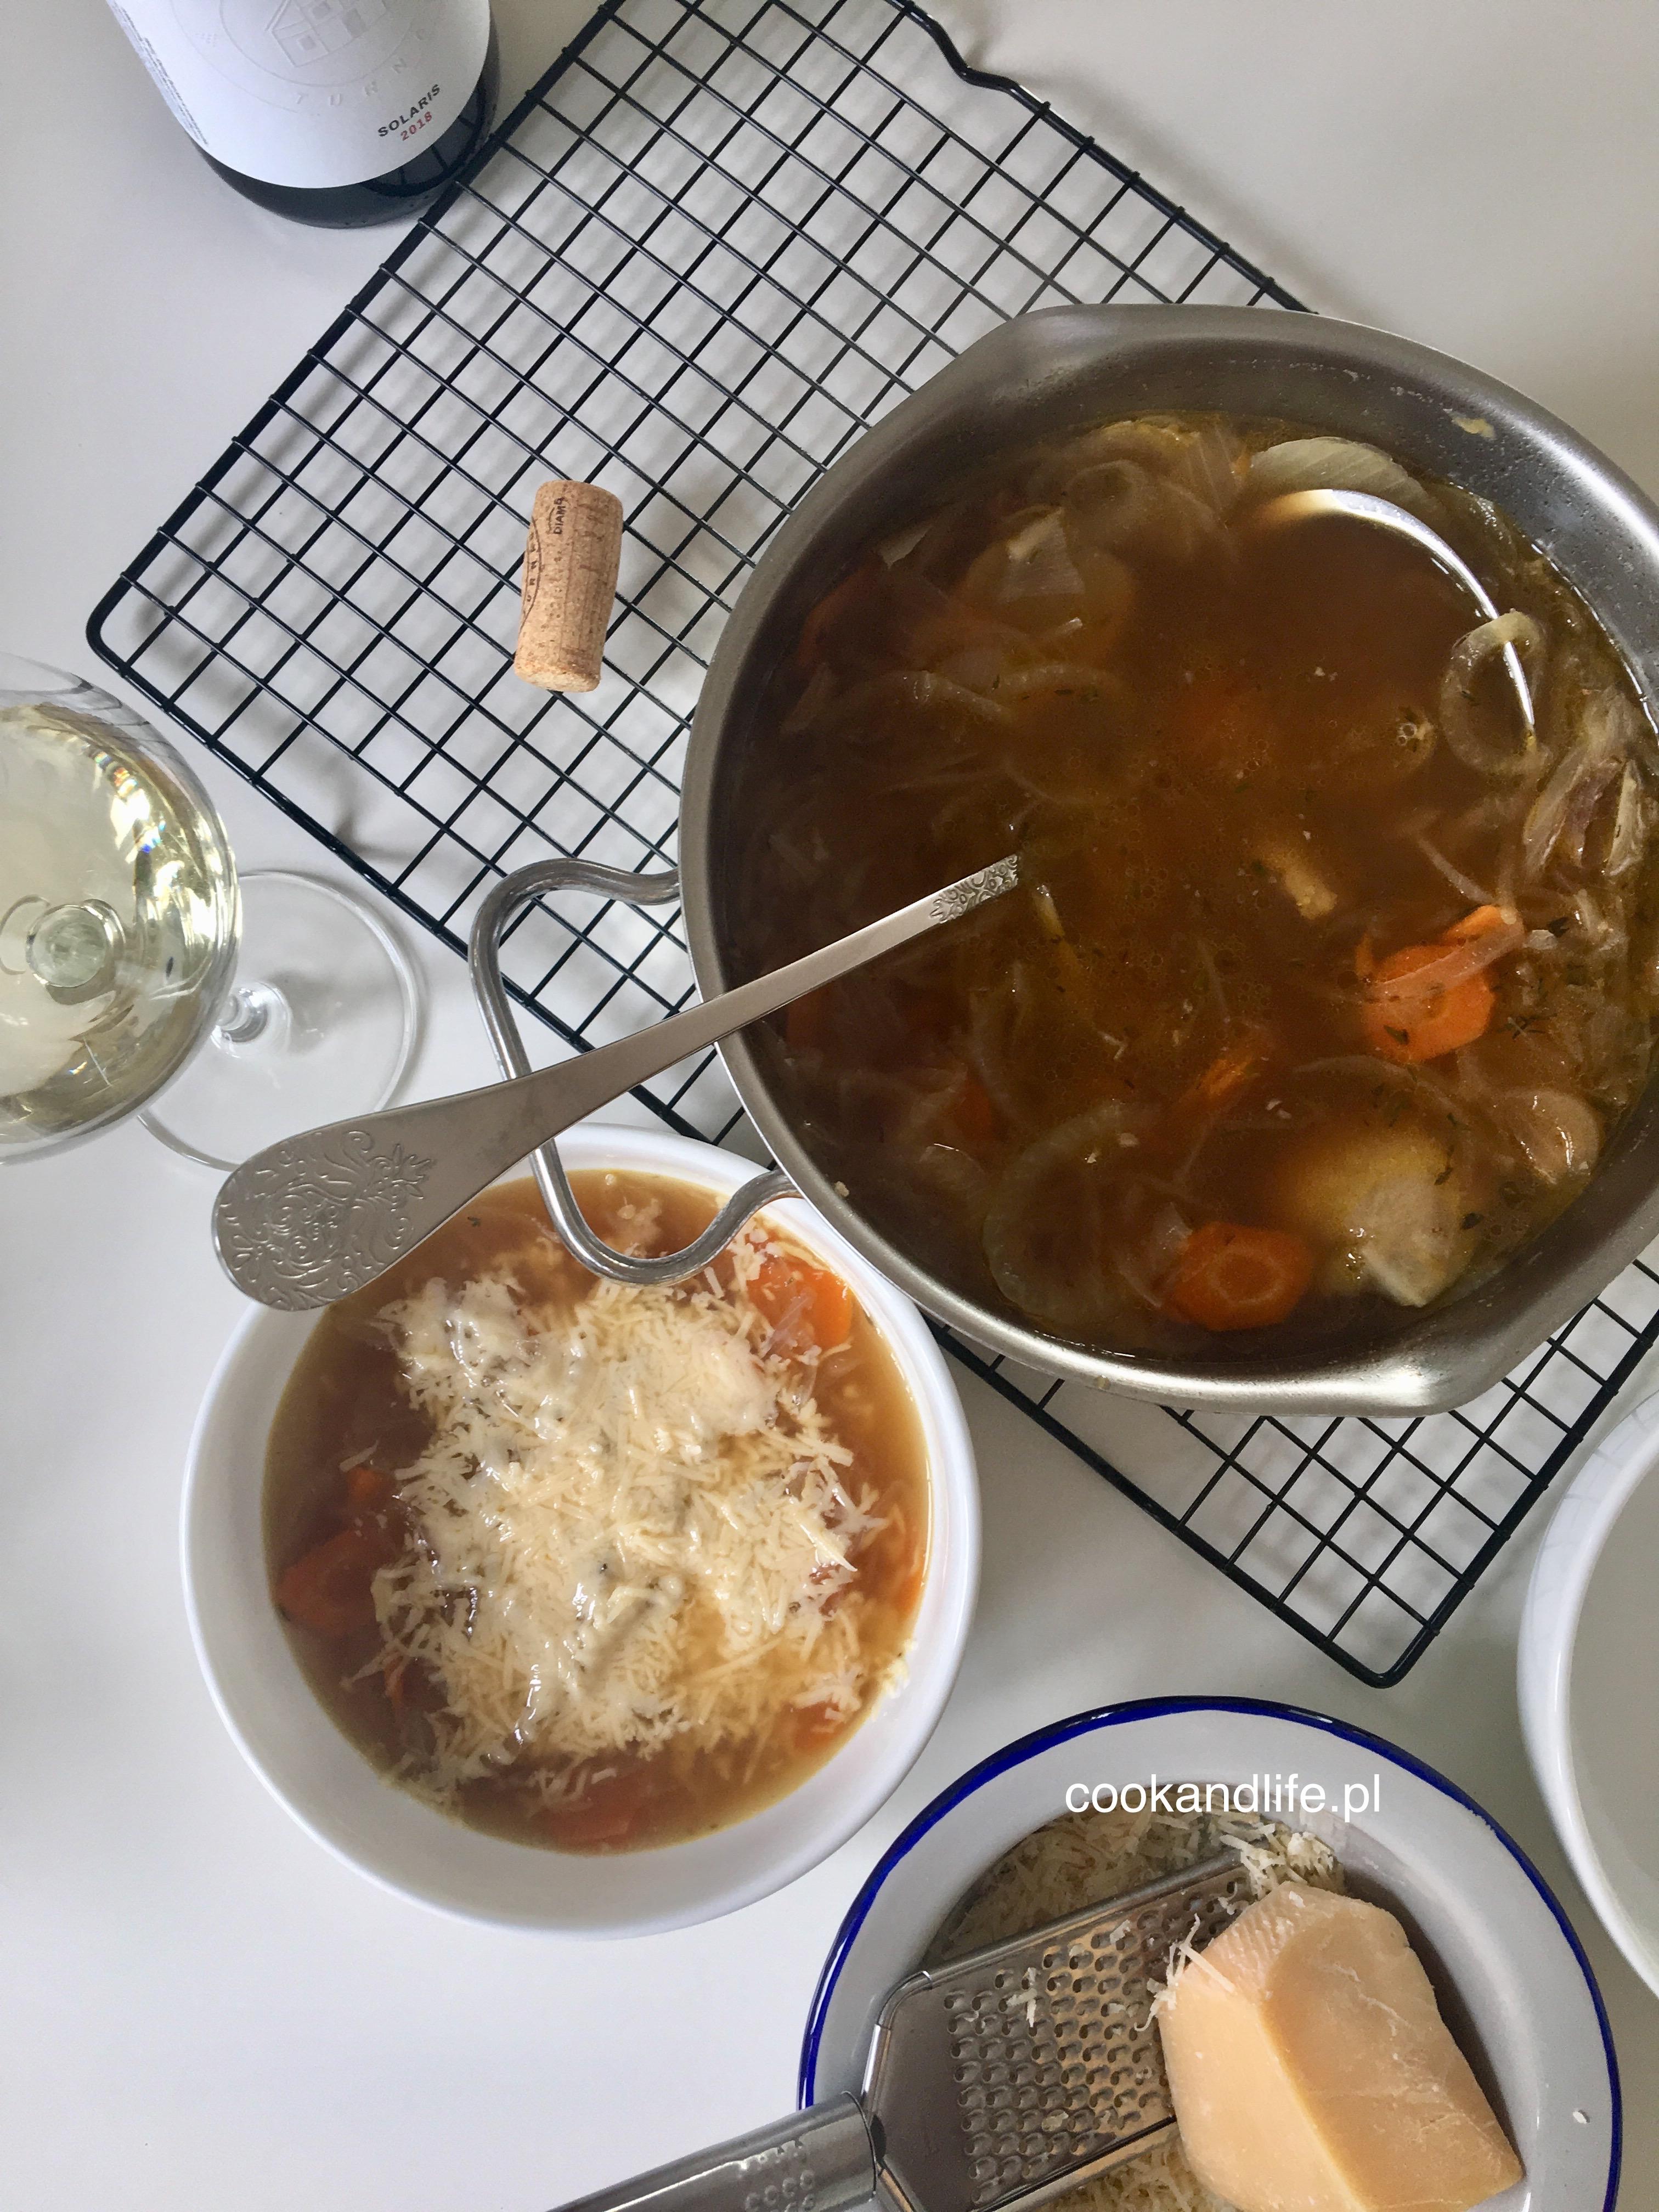 Zupa cebulowa dobra na alergie